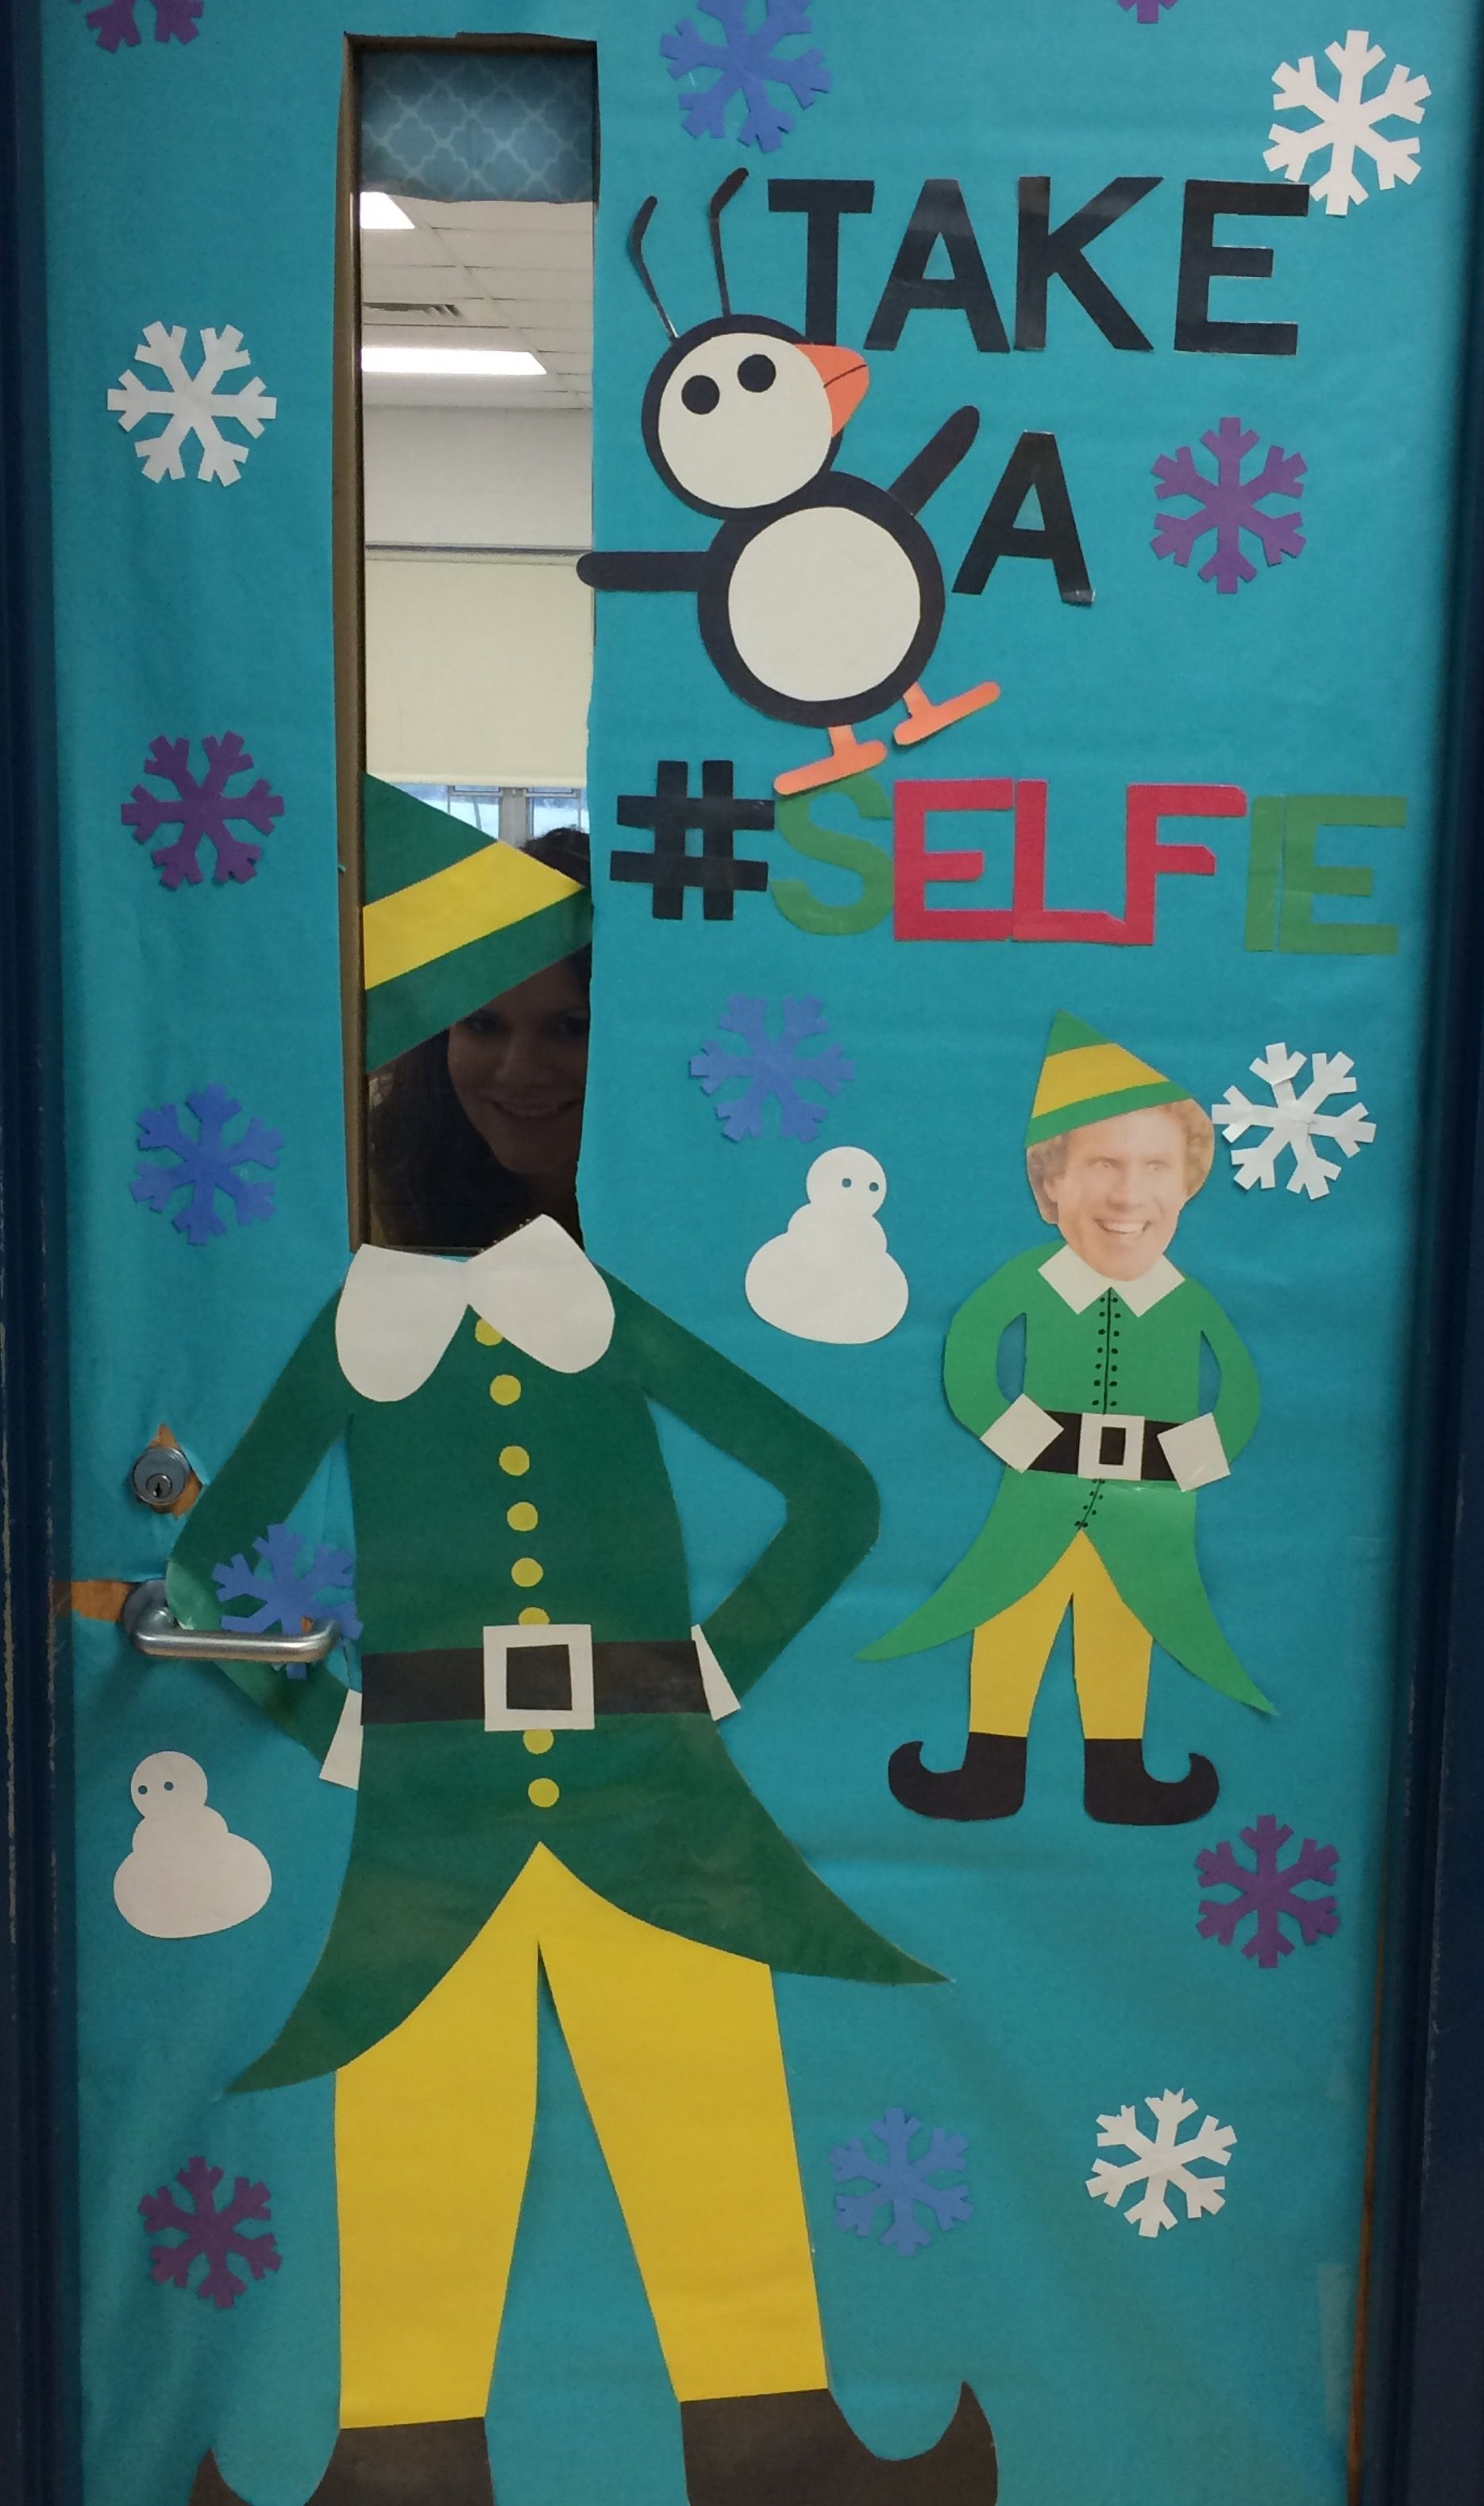 Christmas Door Ideas Selfie Buddy The Elf Education Christmas